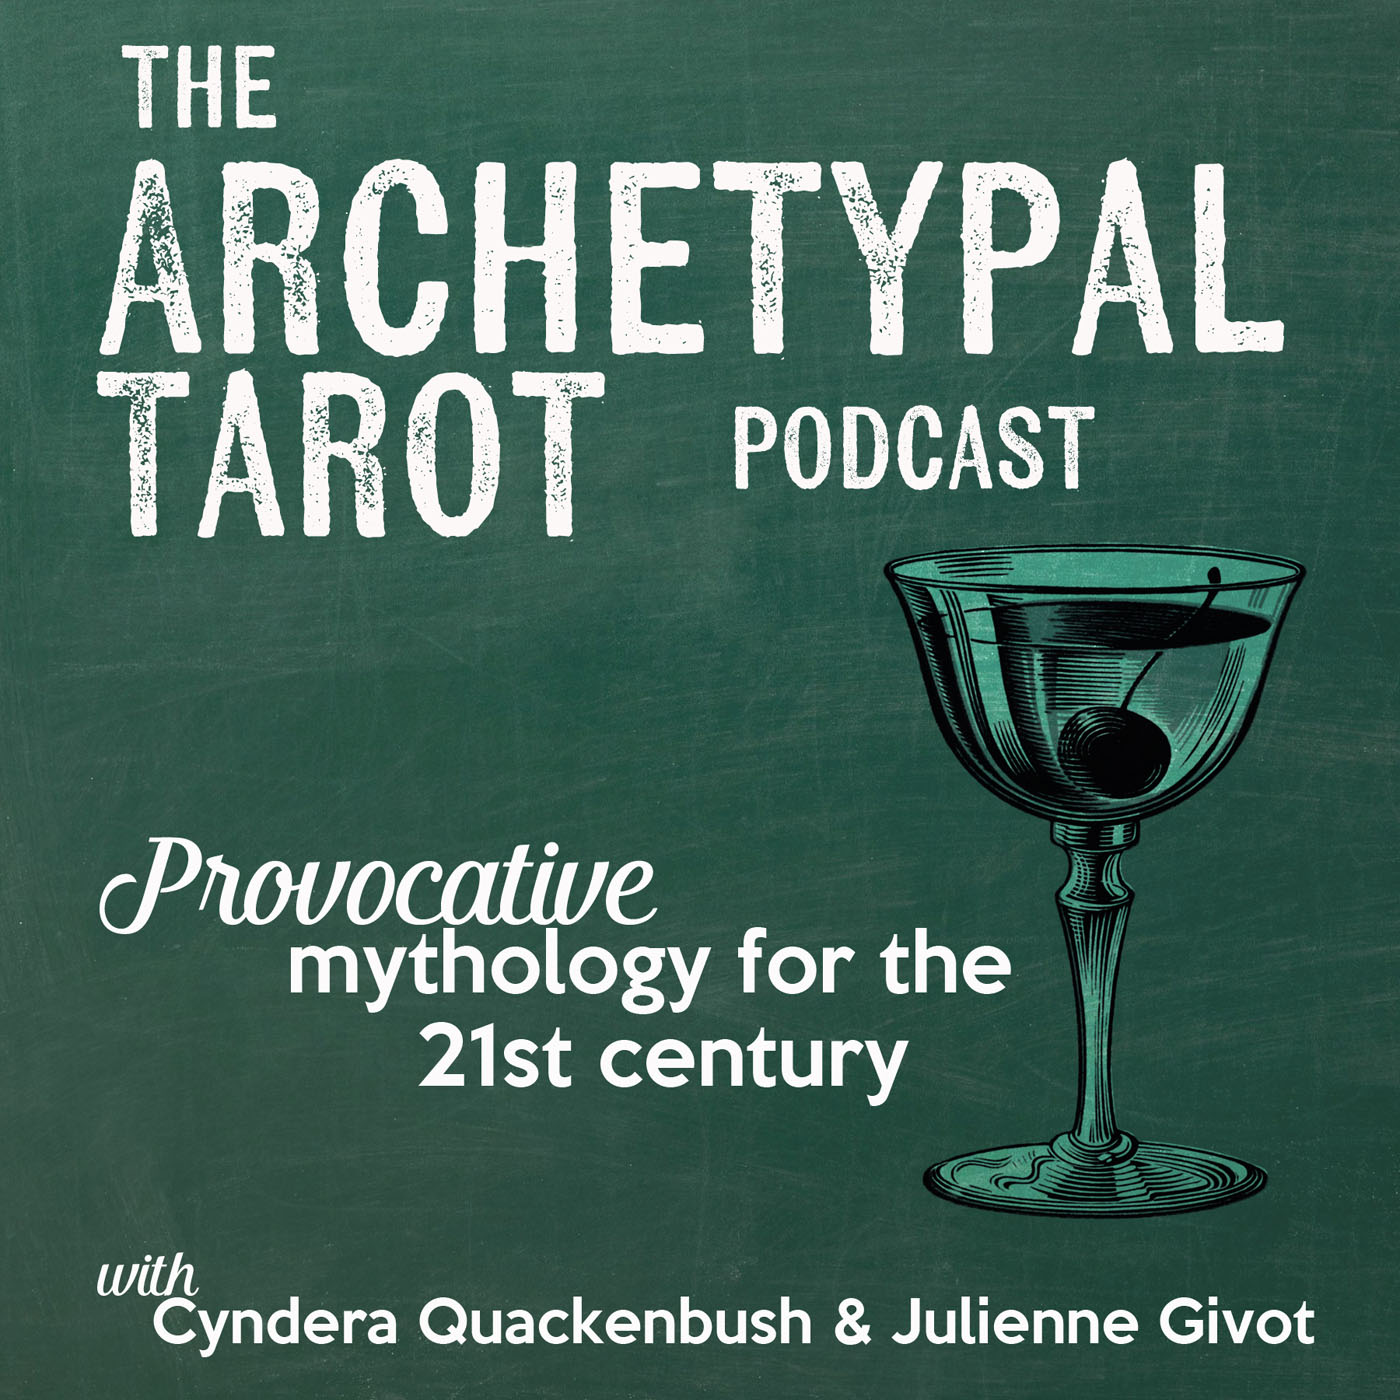 The Archetypal Tarot Podcast